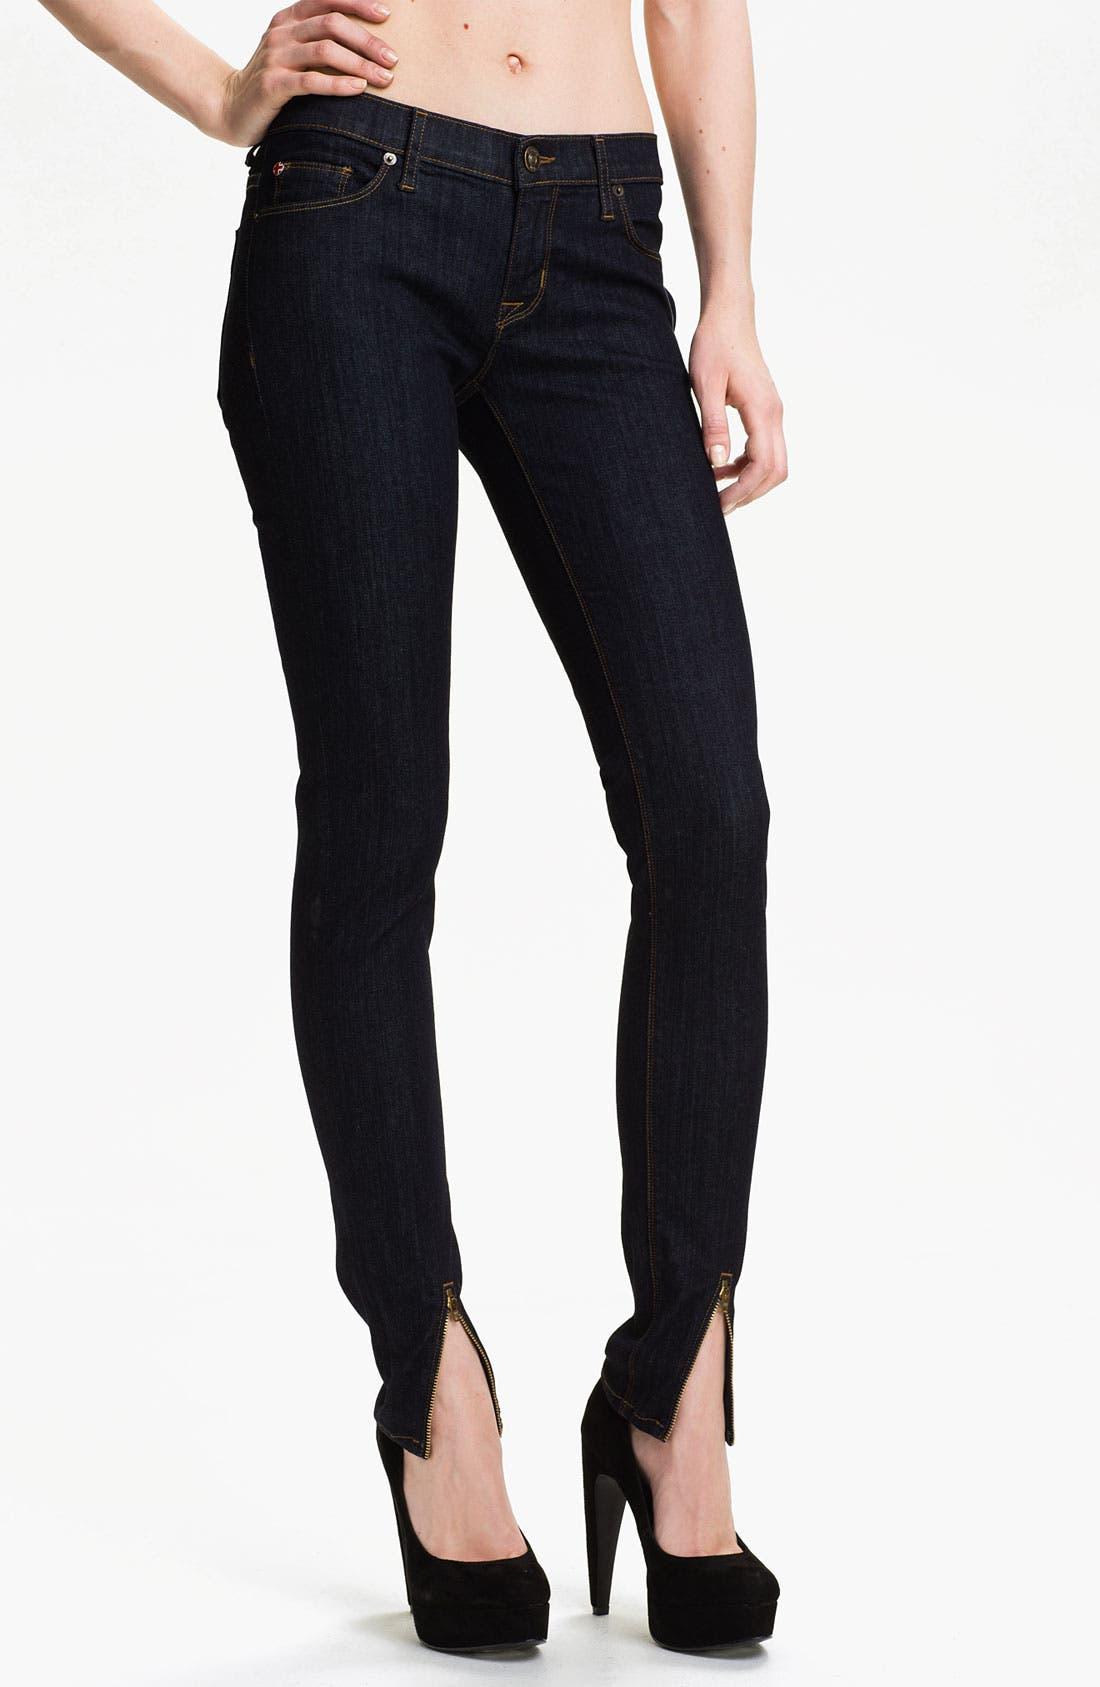 Alternate Image 1 Selected - Hudson Jeans 'Juliette' Ankle Zip Super Skinny Jeans (Rinse)